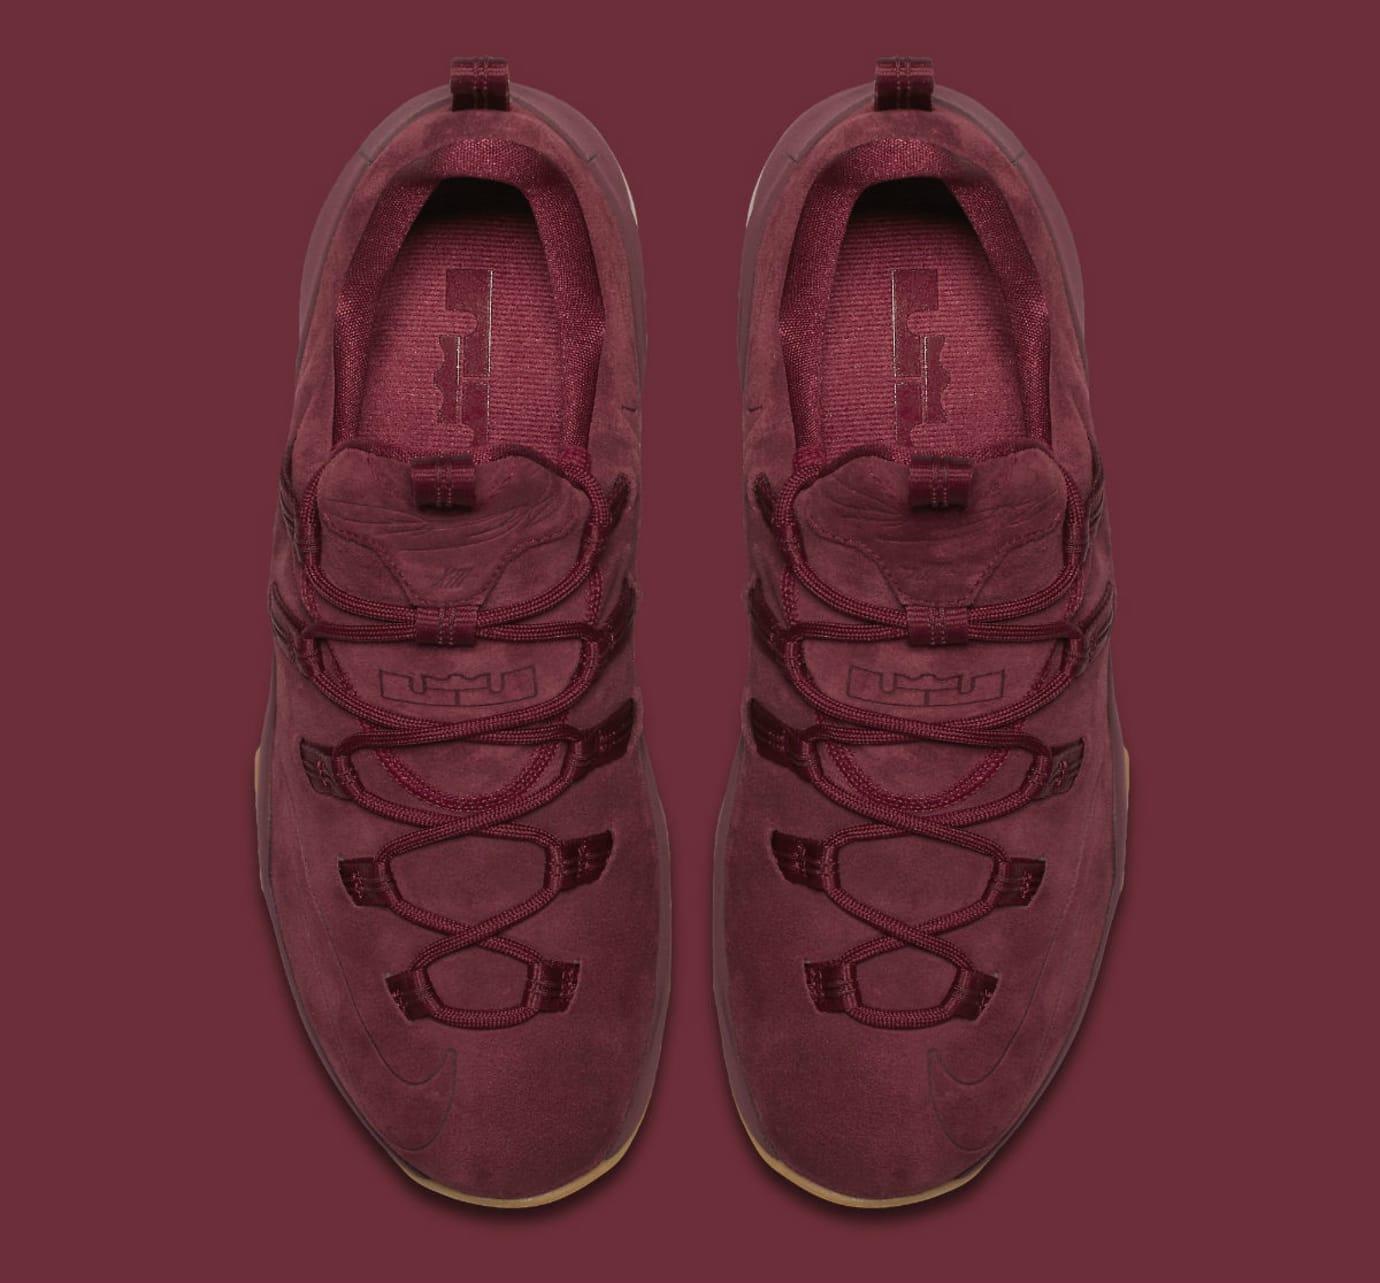 brand new d5e9a 5b9de Nike LeBron 13 Low Premium Team Red Release Date Top AH8289-600